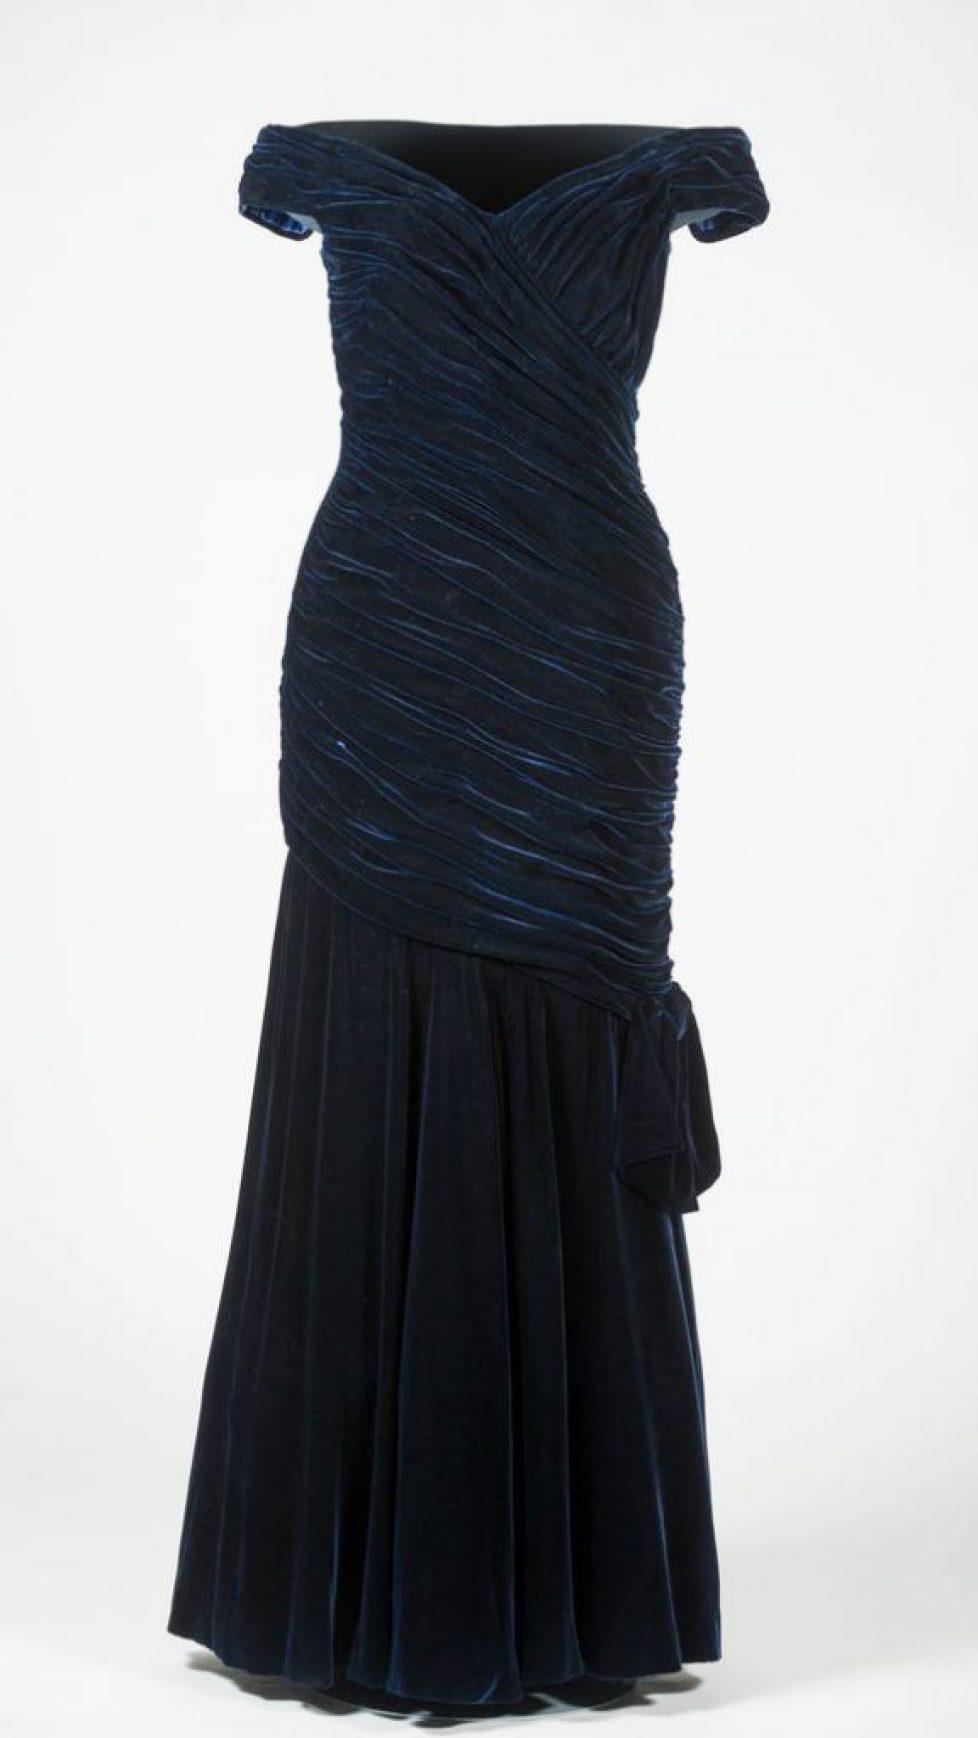 636148230079645318--Travolta-dress---Ink-blue-velvet-Victor-Edelstein